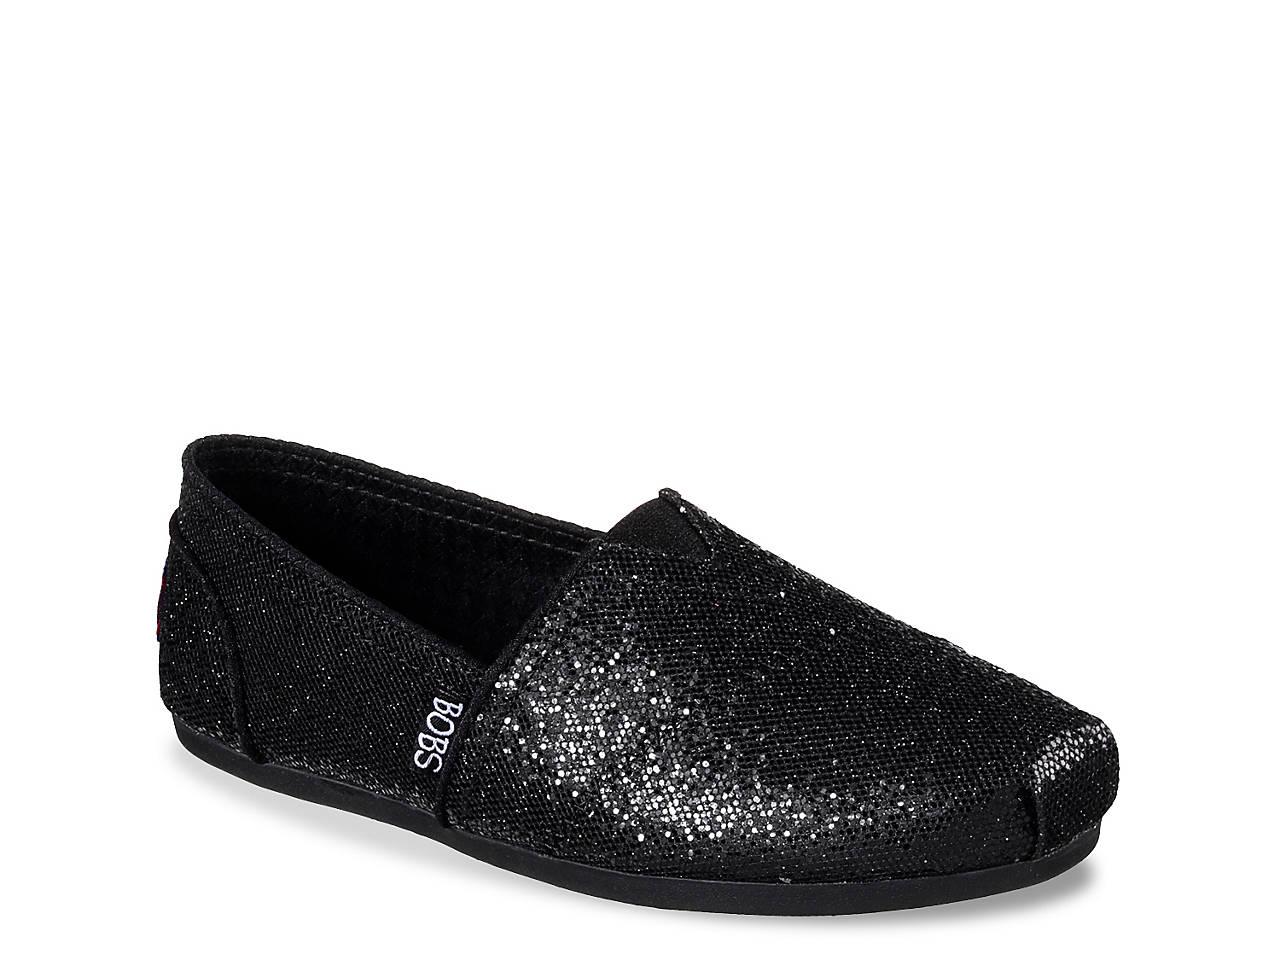 35590e42f225 BOBS from Skechers Plush Friday Night Slip-On Women s Shoes